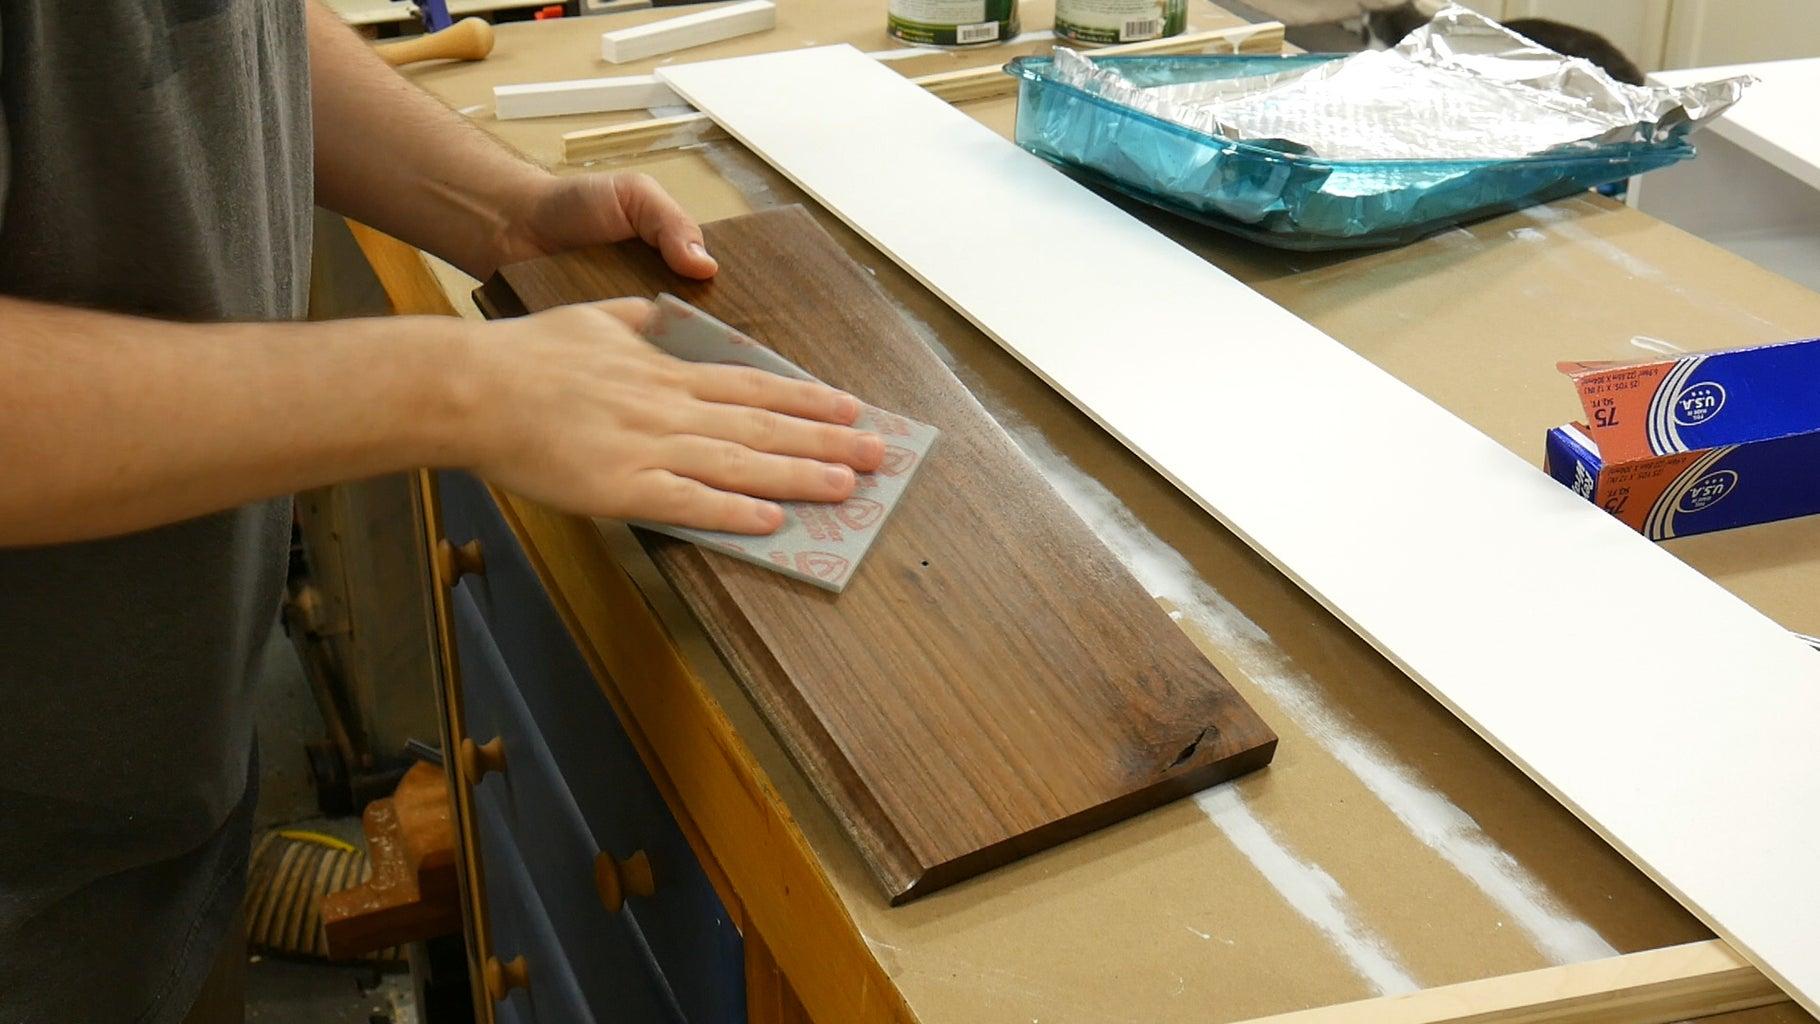 Varnishing Drawer Fronts